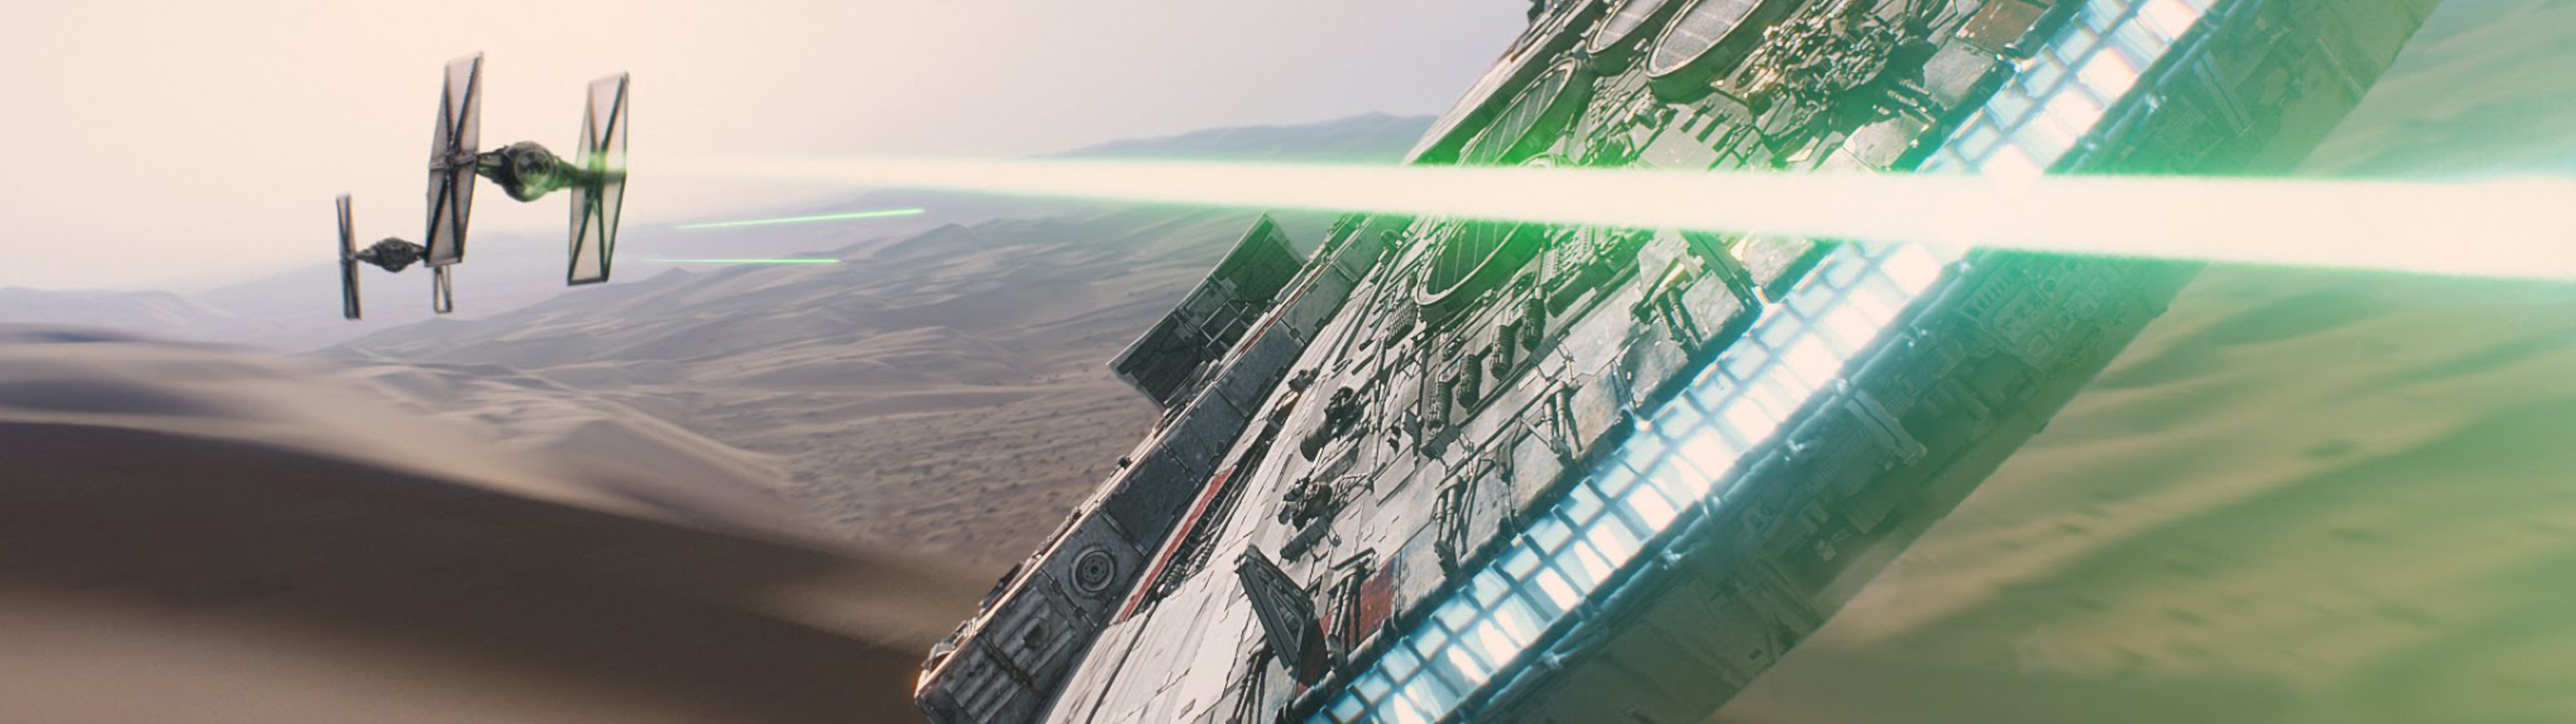 Star Wars Dual Screen Wallpaper 3840×1080